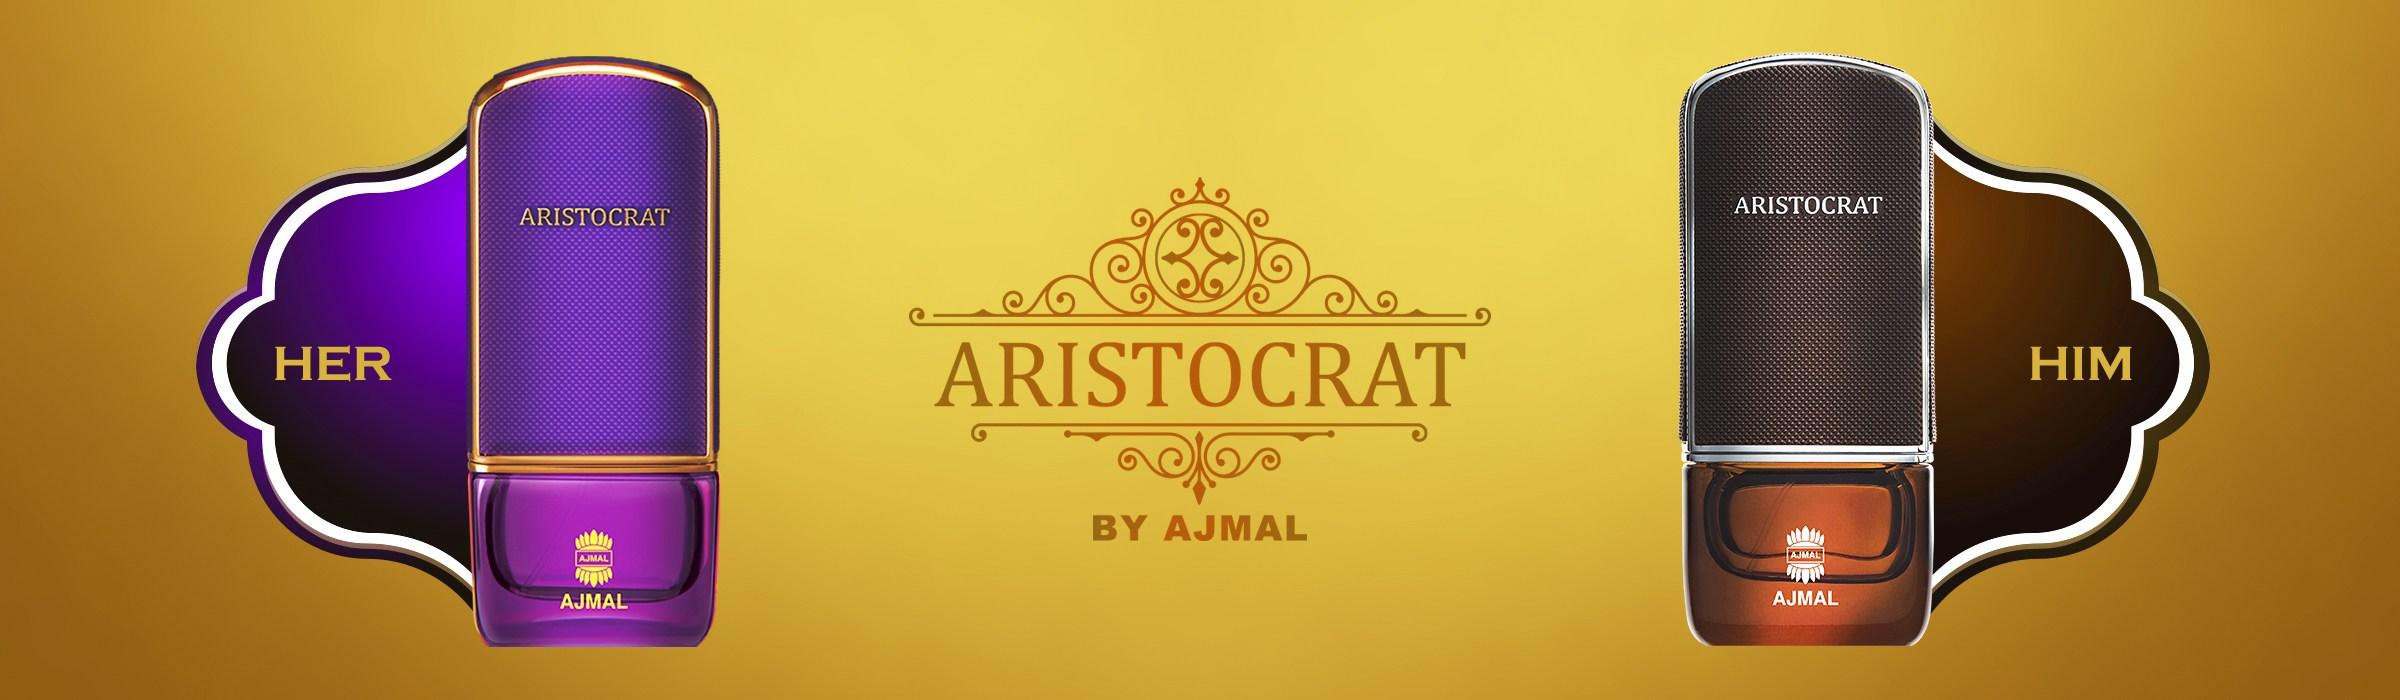 Aristocrat By Ajmal